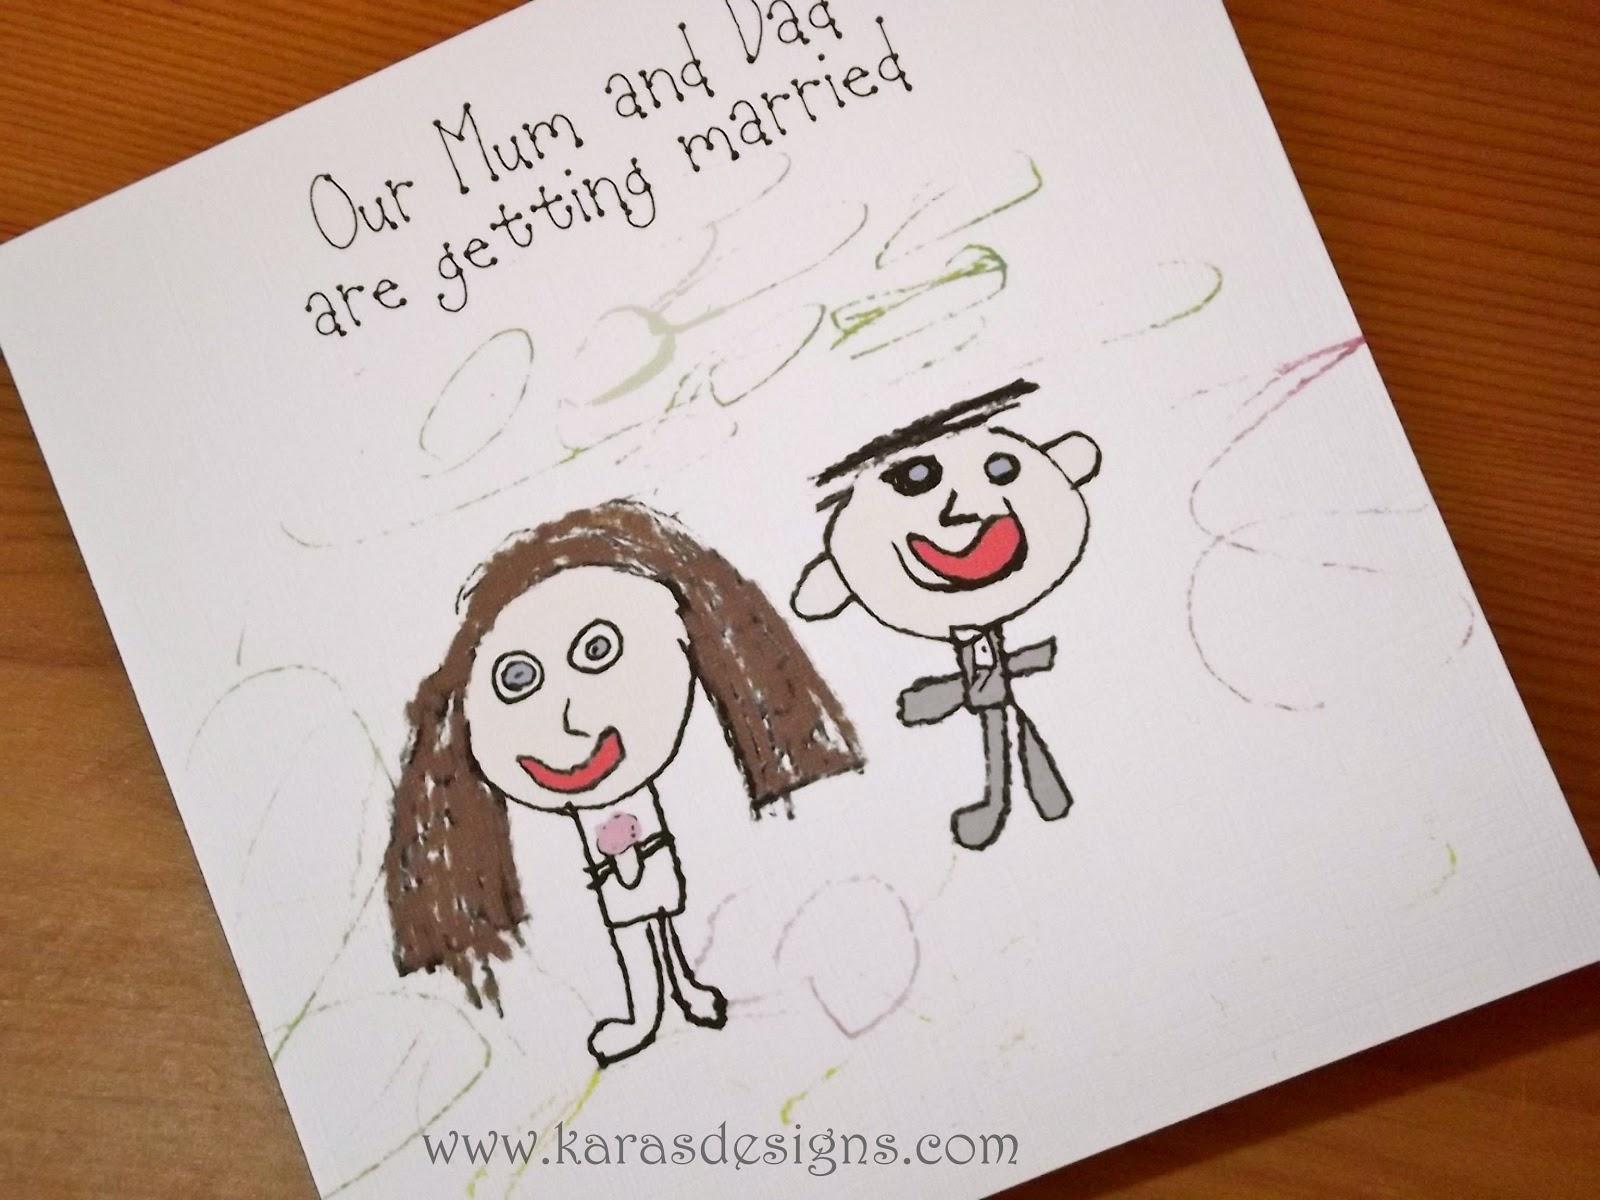 Www Karasdesigns Com Kids Drawn Wedding Invites